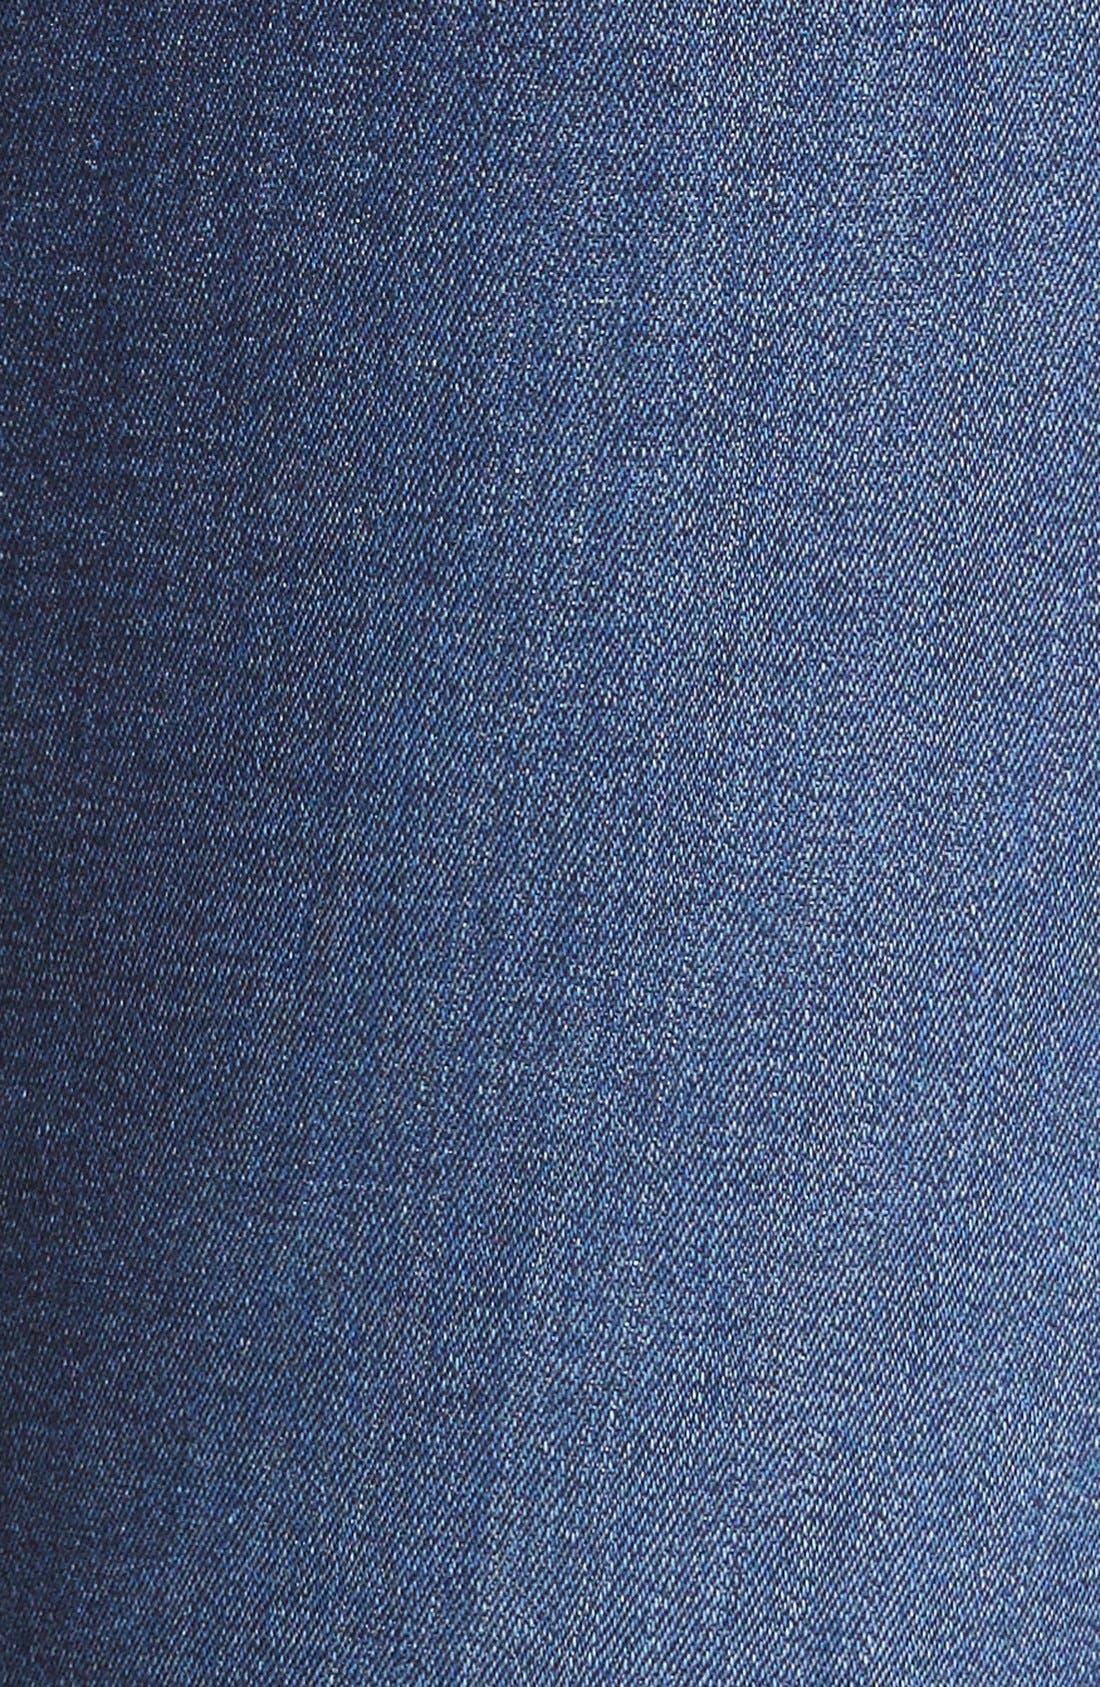 7 FOR ALL MANKIND<SUP>®</SUP>, b(air) Kimmie Straight Leg Jeans, Alternate thumbnail 5, color, DUCHESS